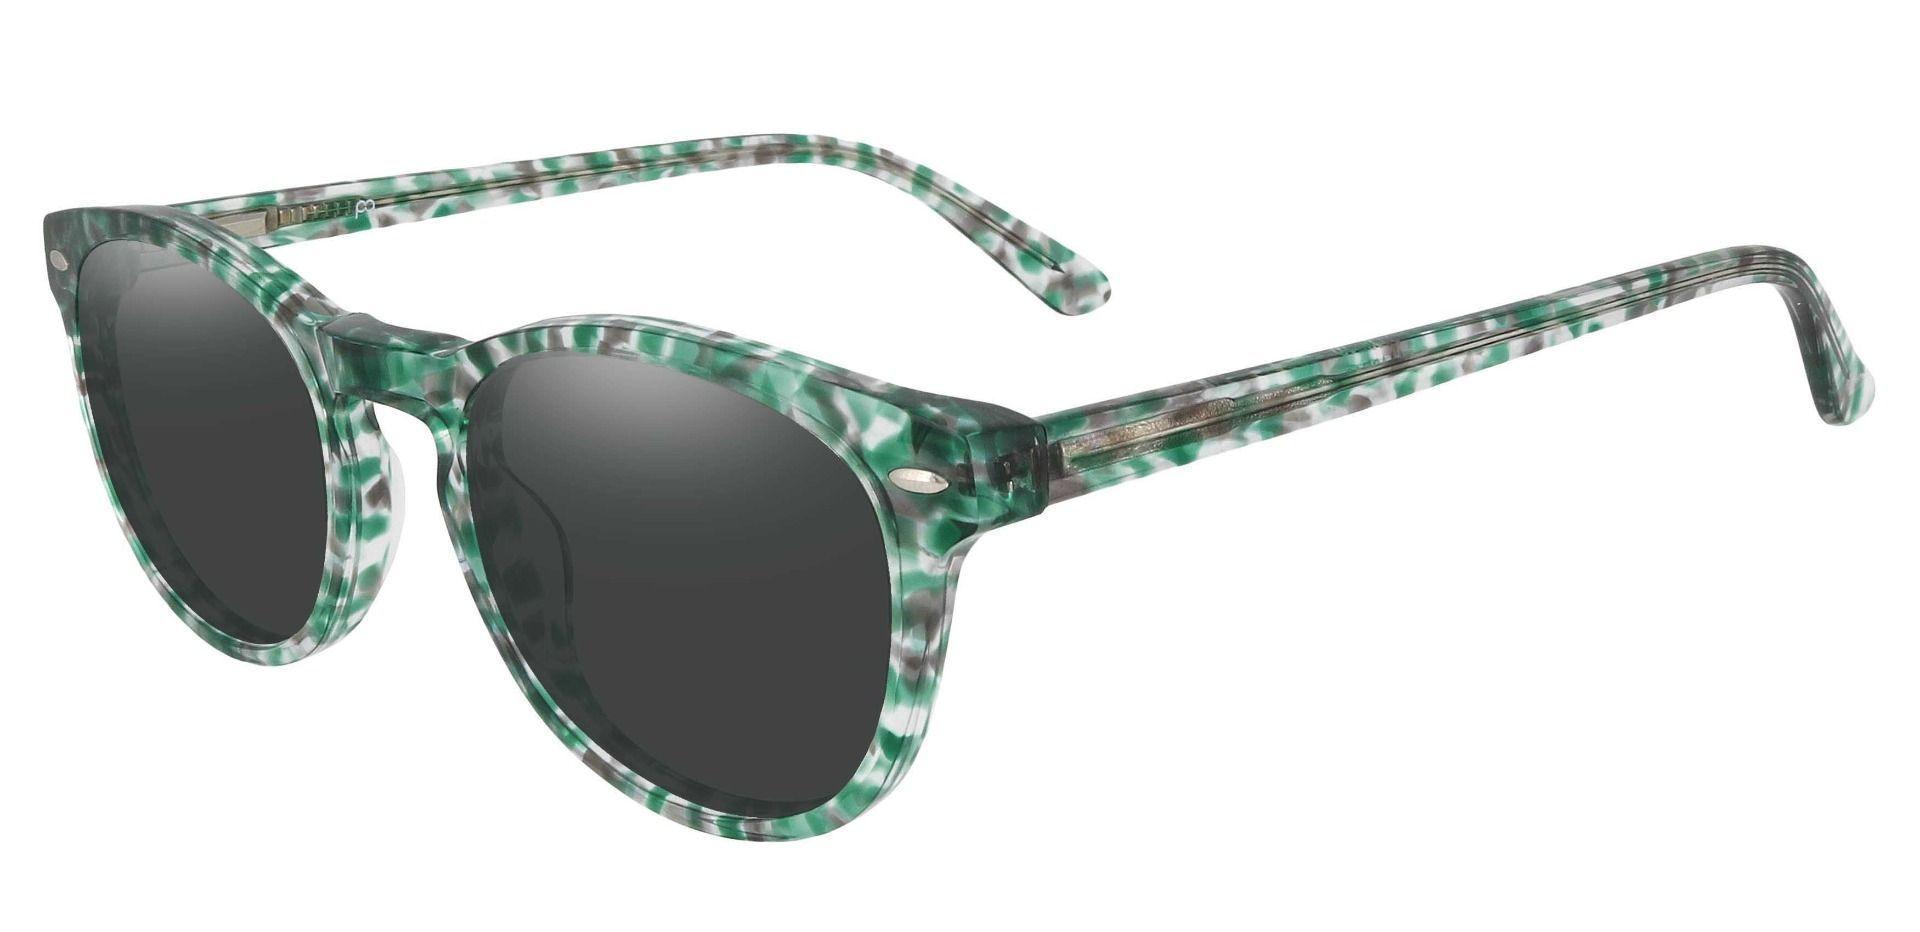 Laguna Oval Prescription Sunglasses - Green Frame With Gray Lenses